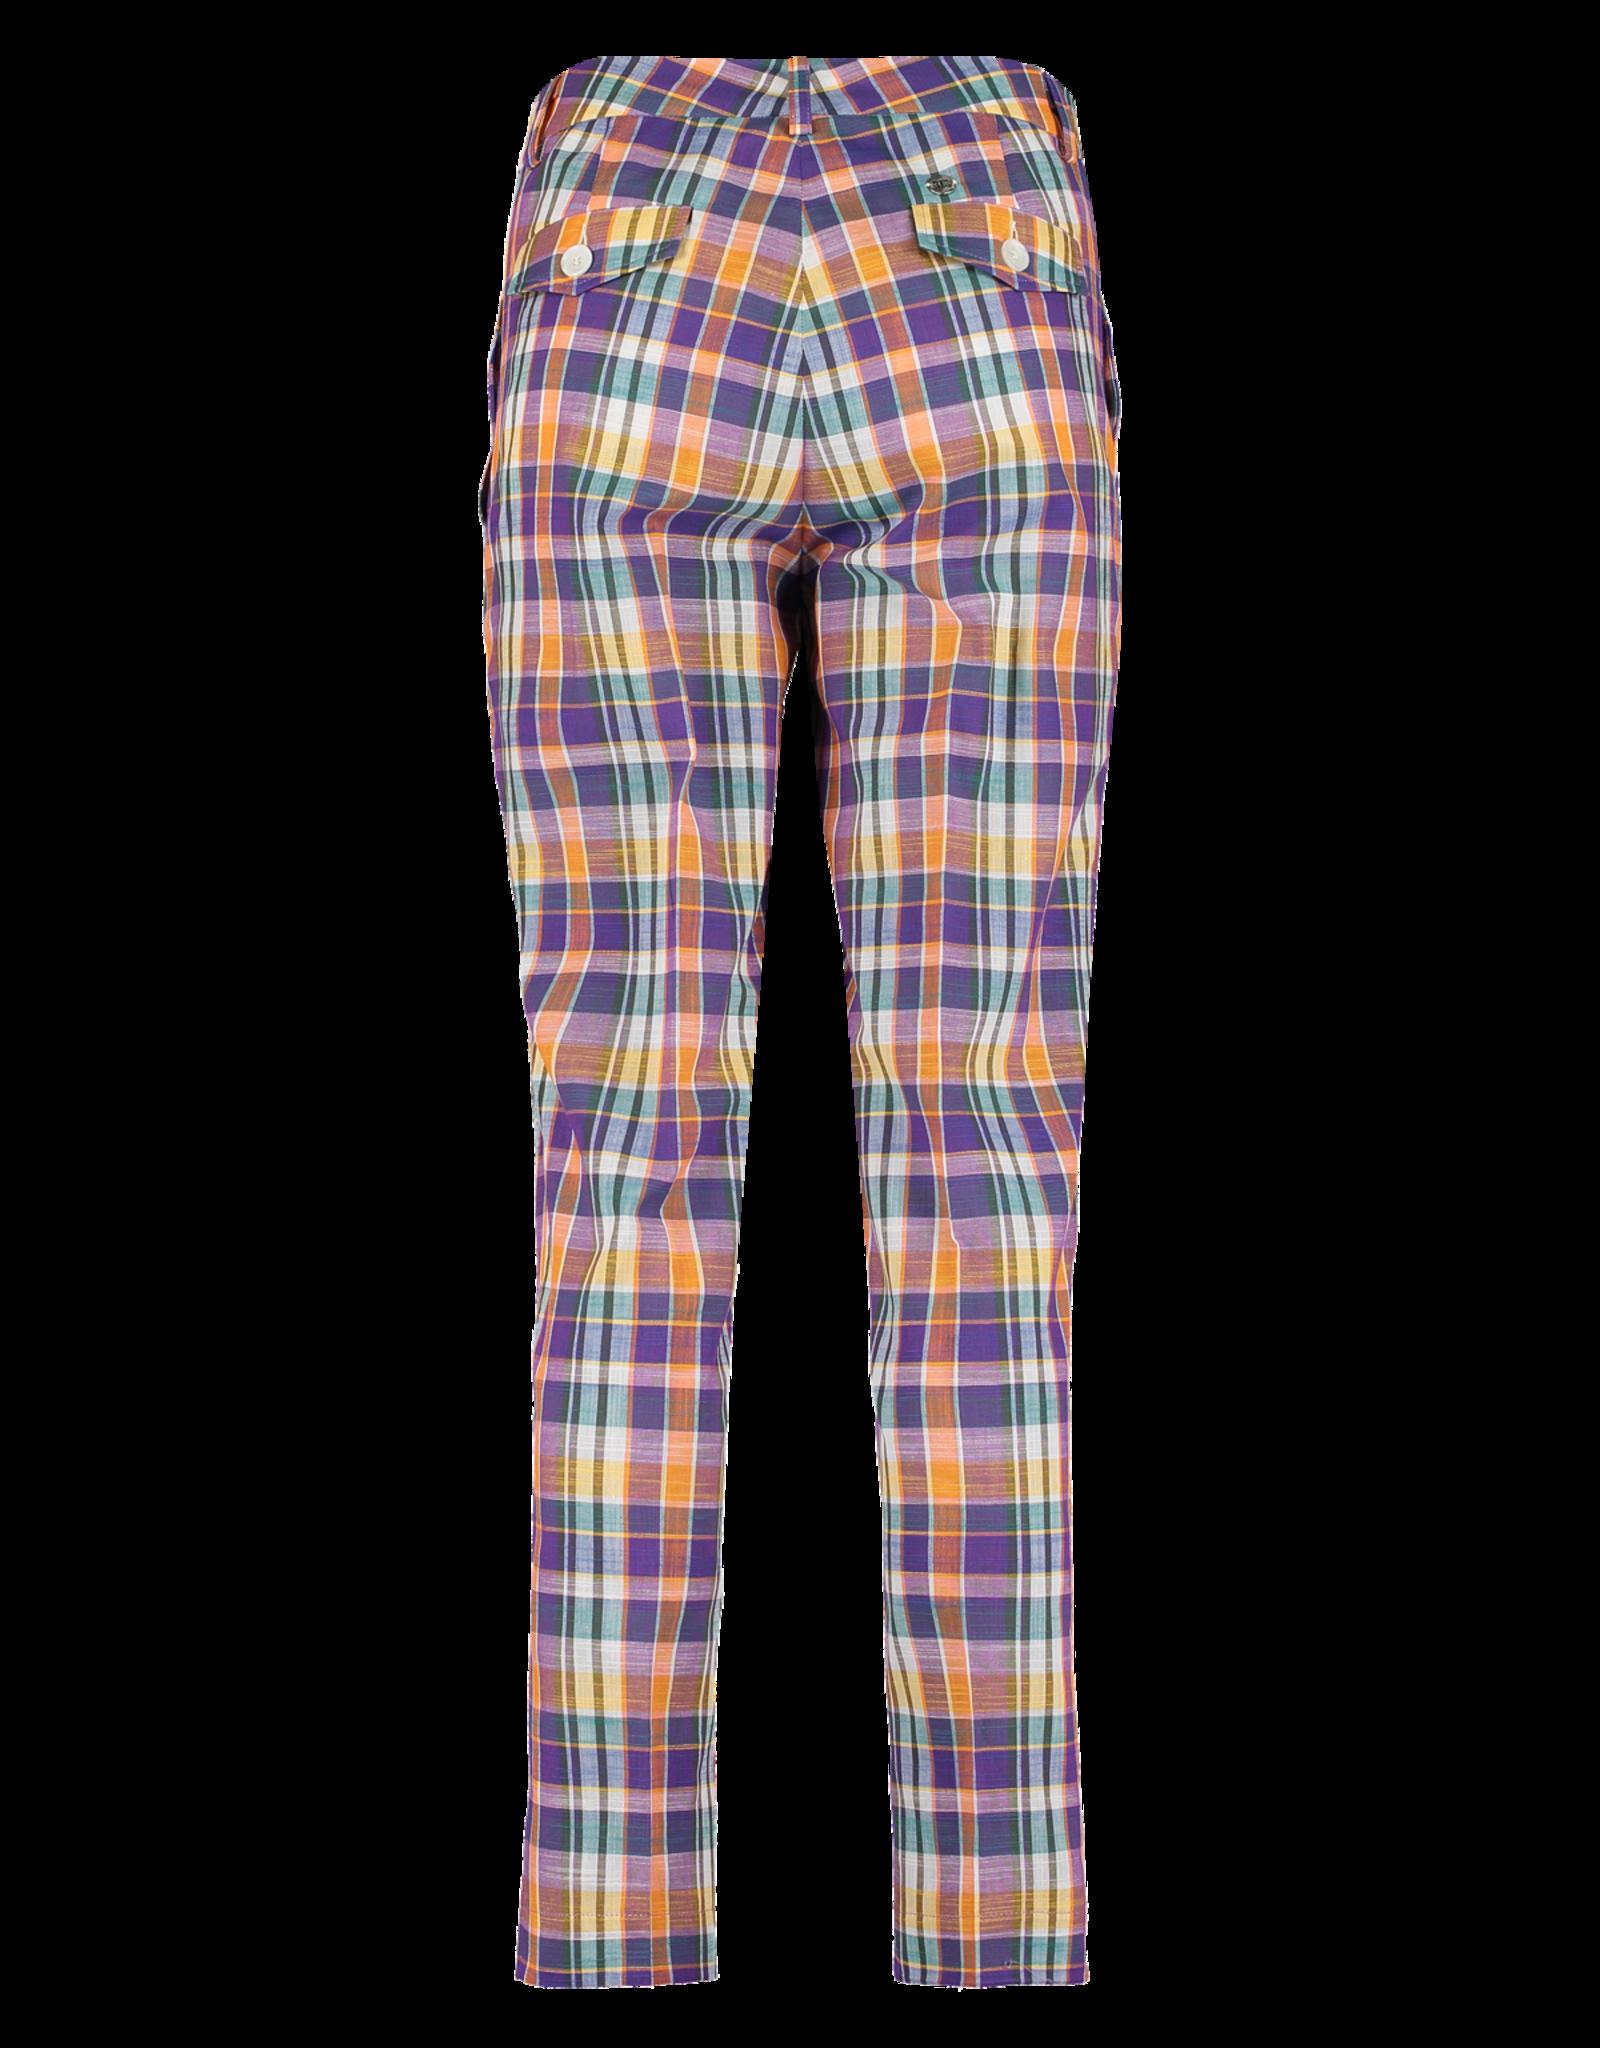 SS20 226-V One Pleat Pants